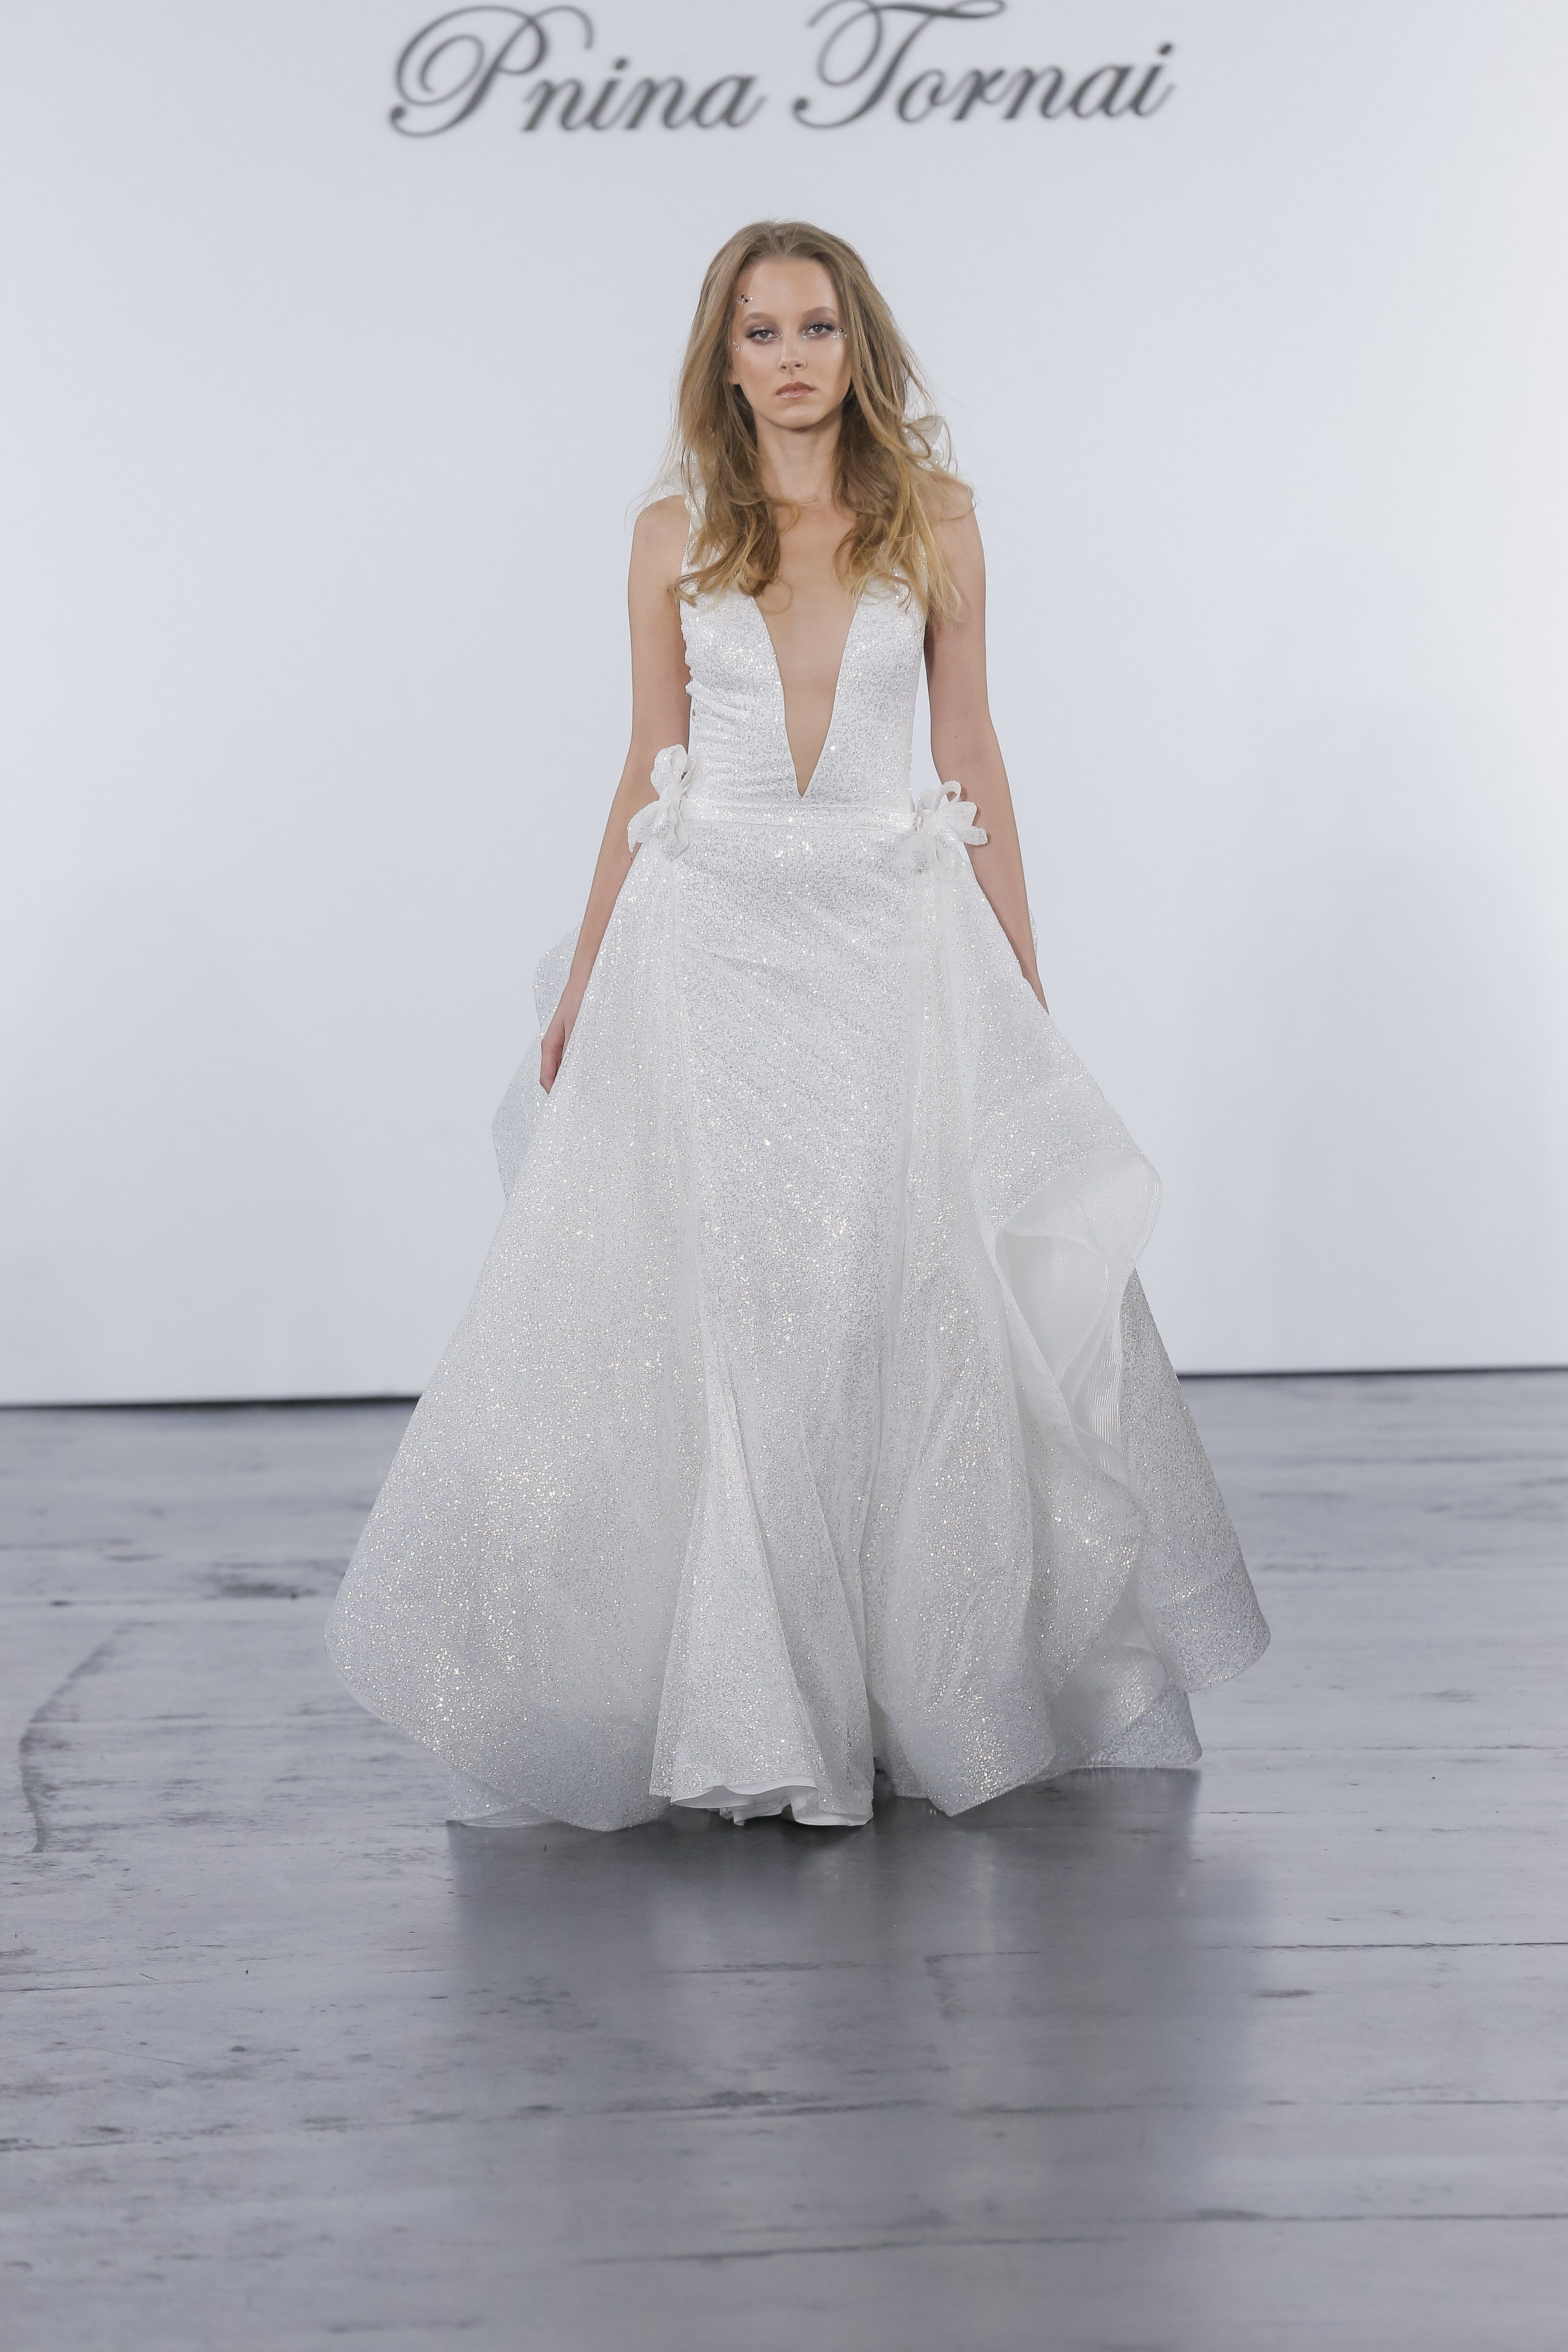 Pnina tornai for kleinfeld bridal u wedding dress collection fall